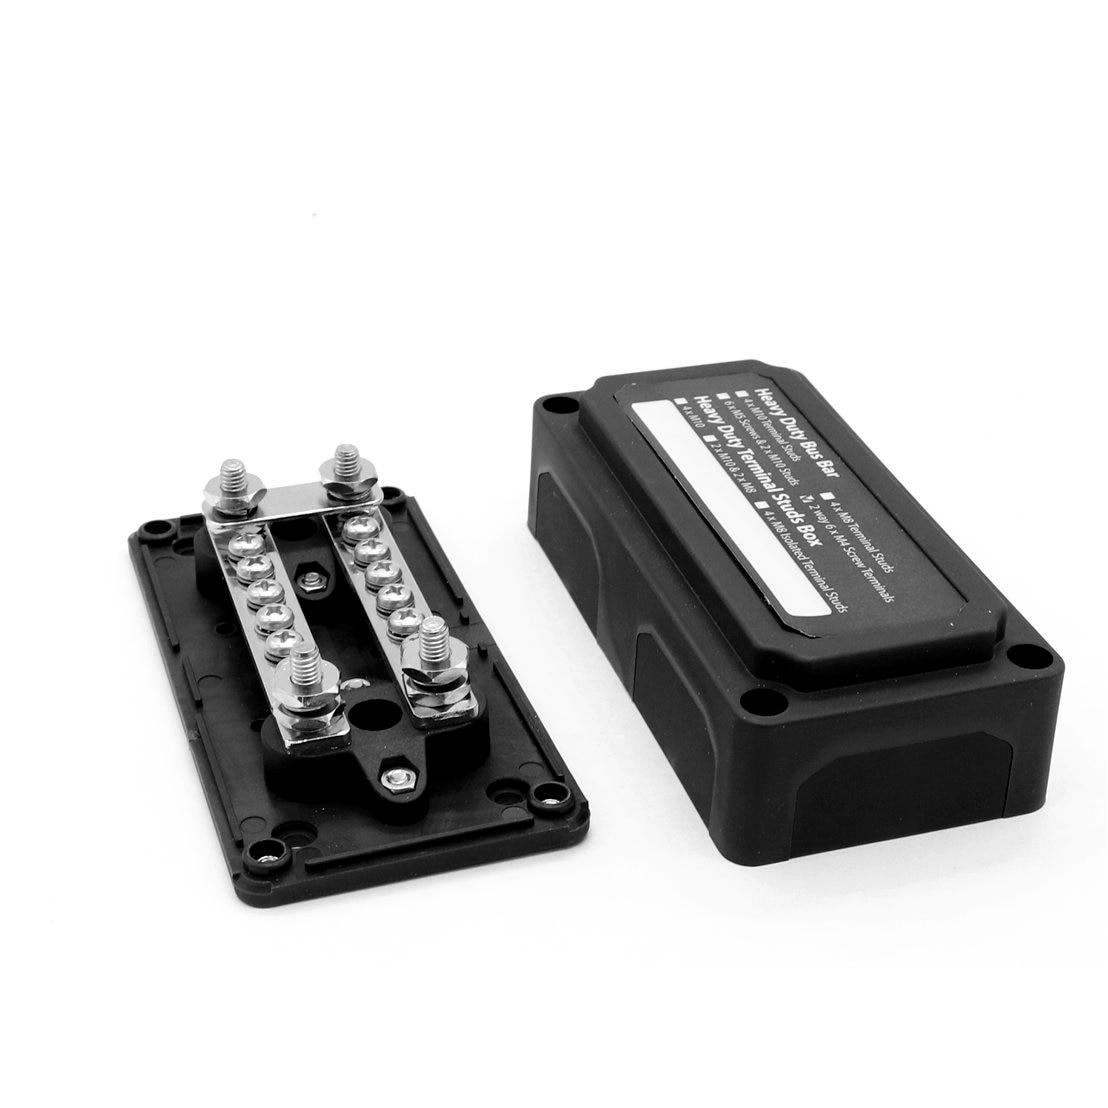 Universal 48VDC Car Bus Bar Power Negative Distribution Box Black Terminal Block 3Model Heavy Brass Nickel Plated